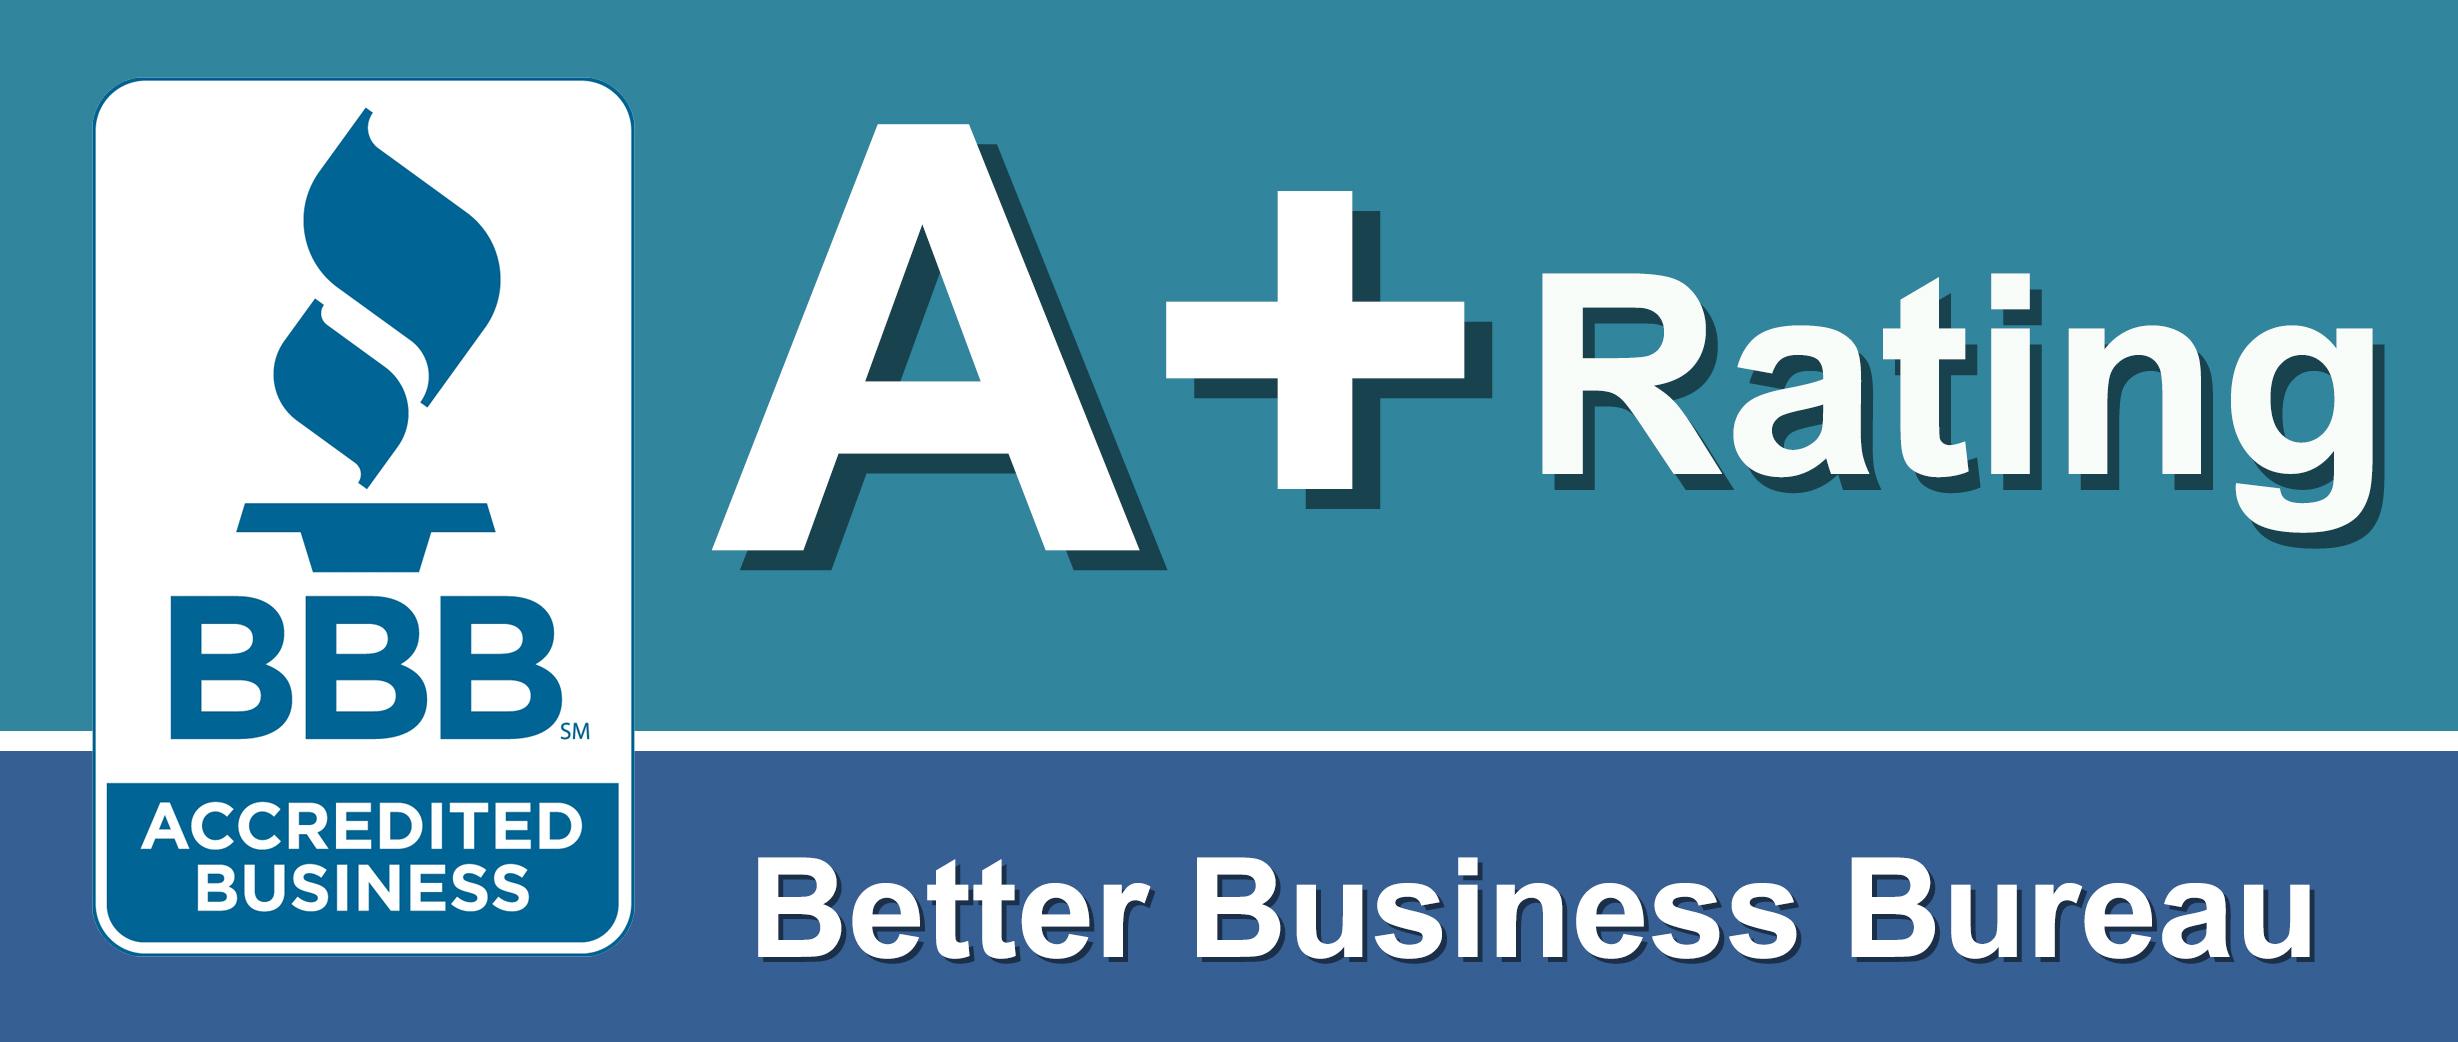 better business bureau georgia complaints